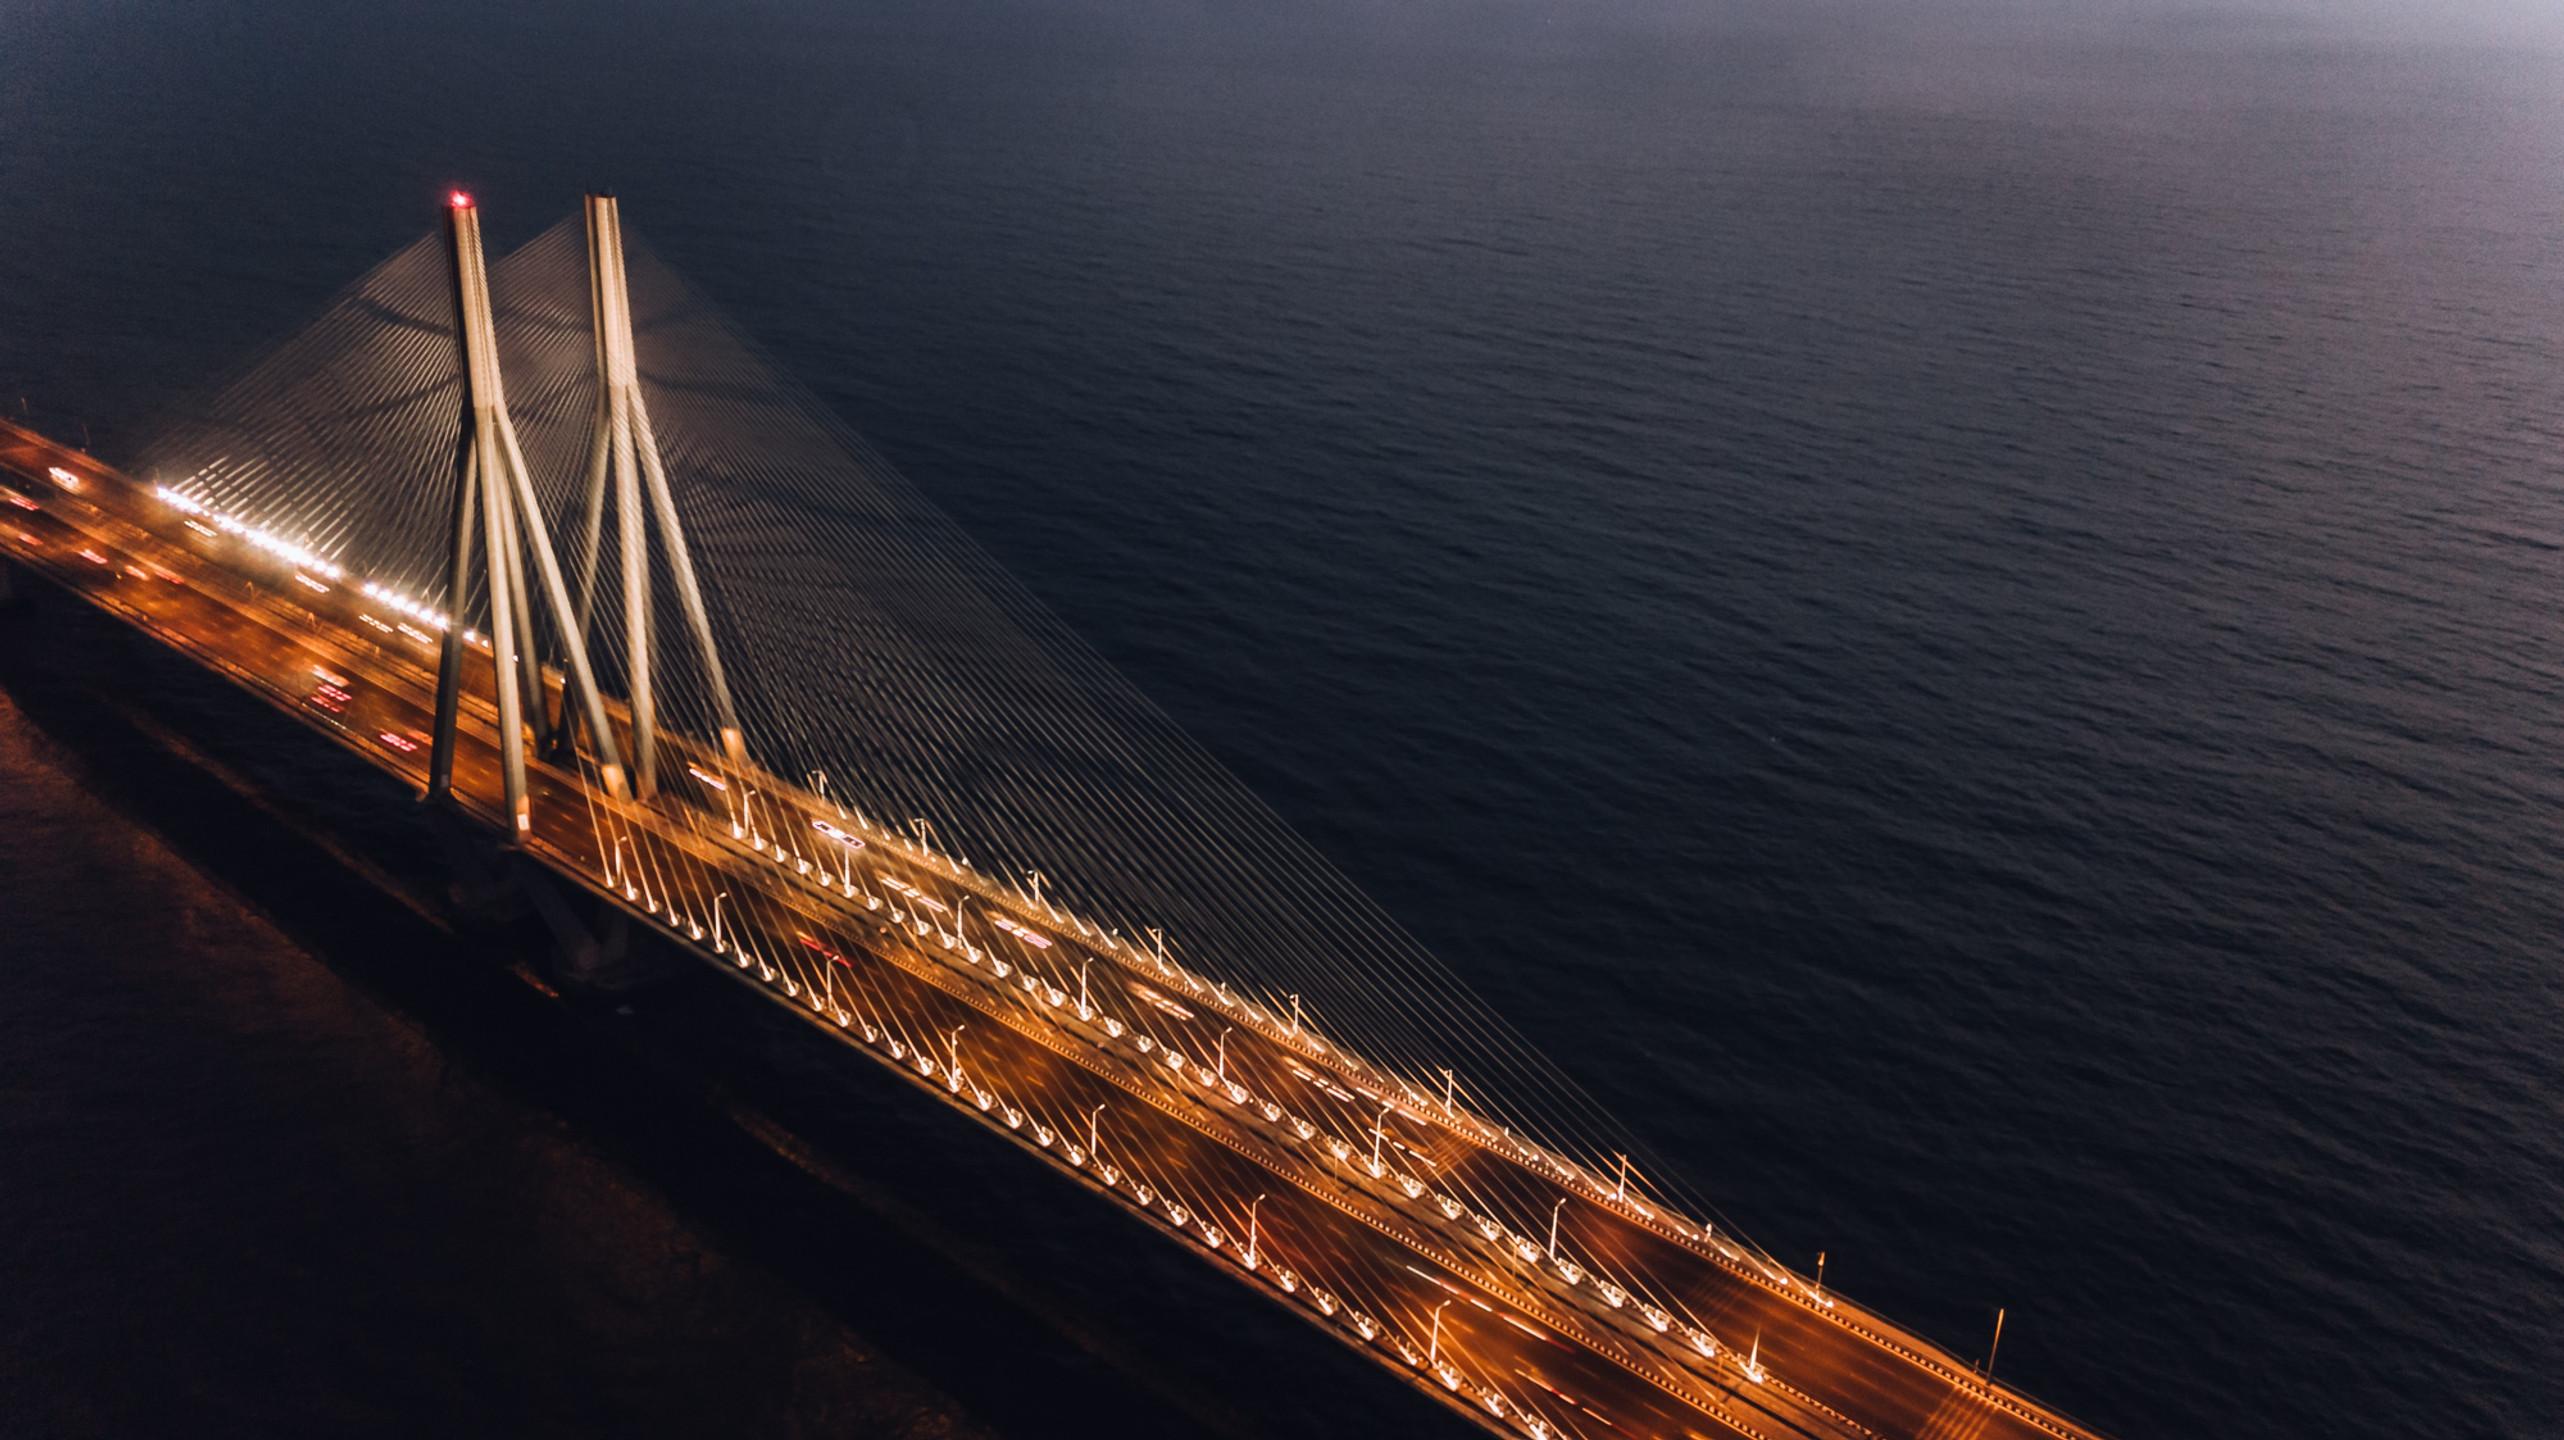 Bandra-Worli Sea Link, Mumbai, India.